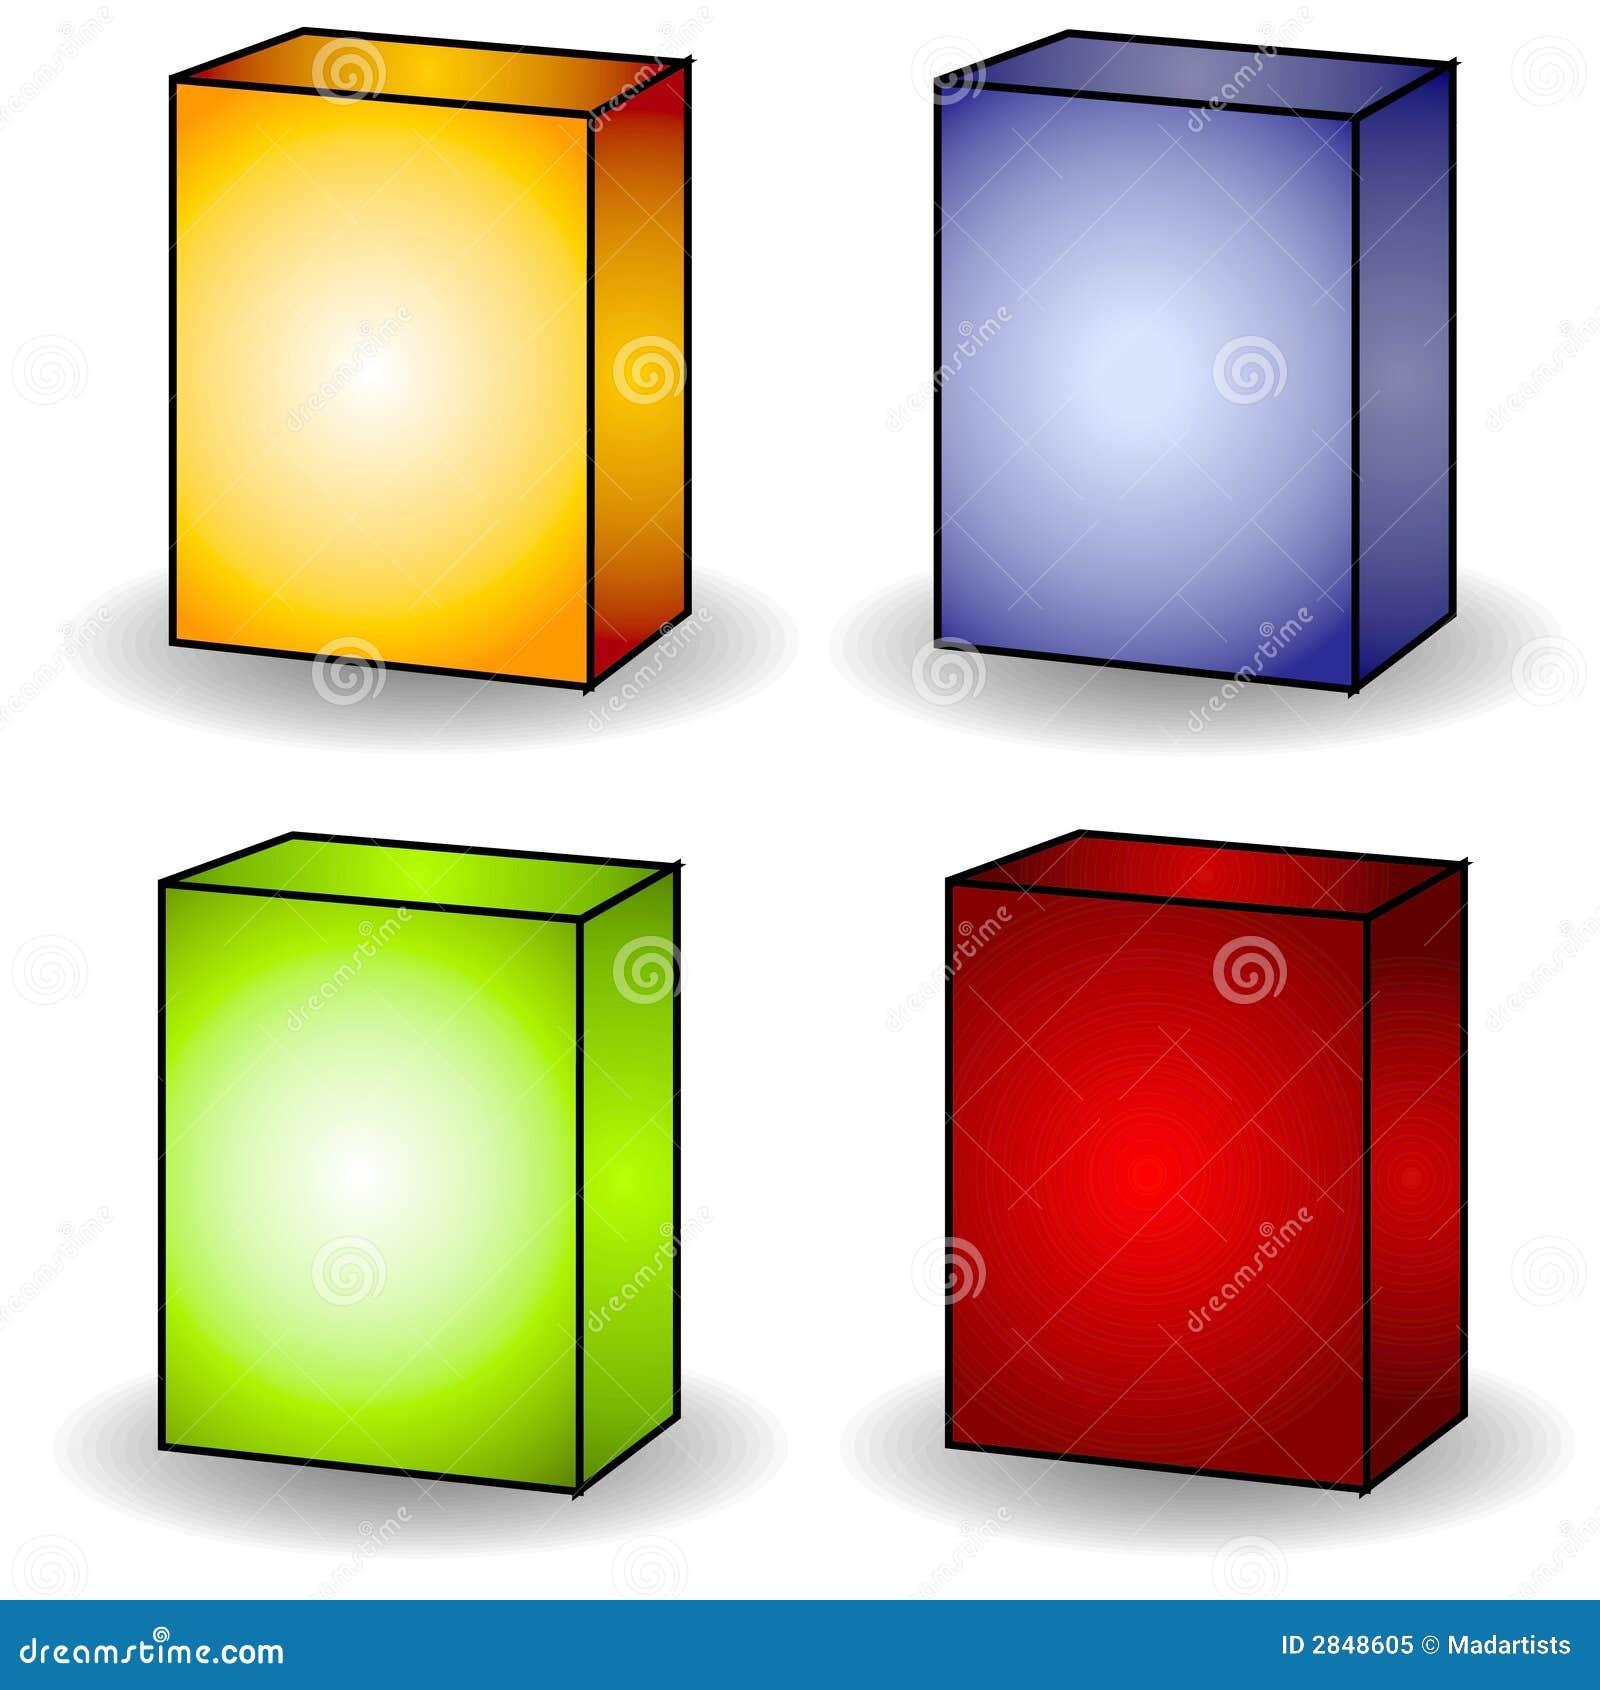 4 blank box covers clip art stock illustration illustration of rh dreamstime com clip art box tops clip art boxing ring